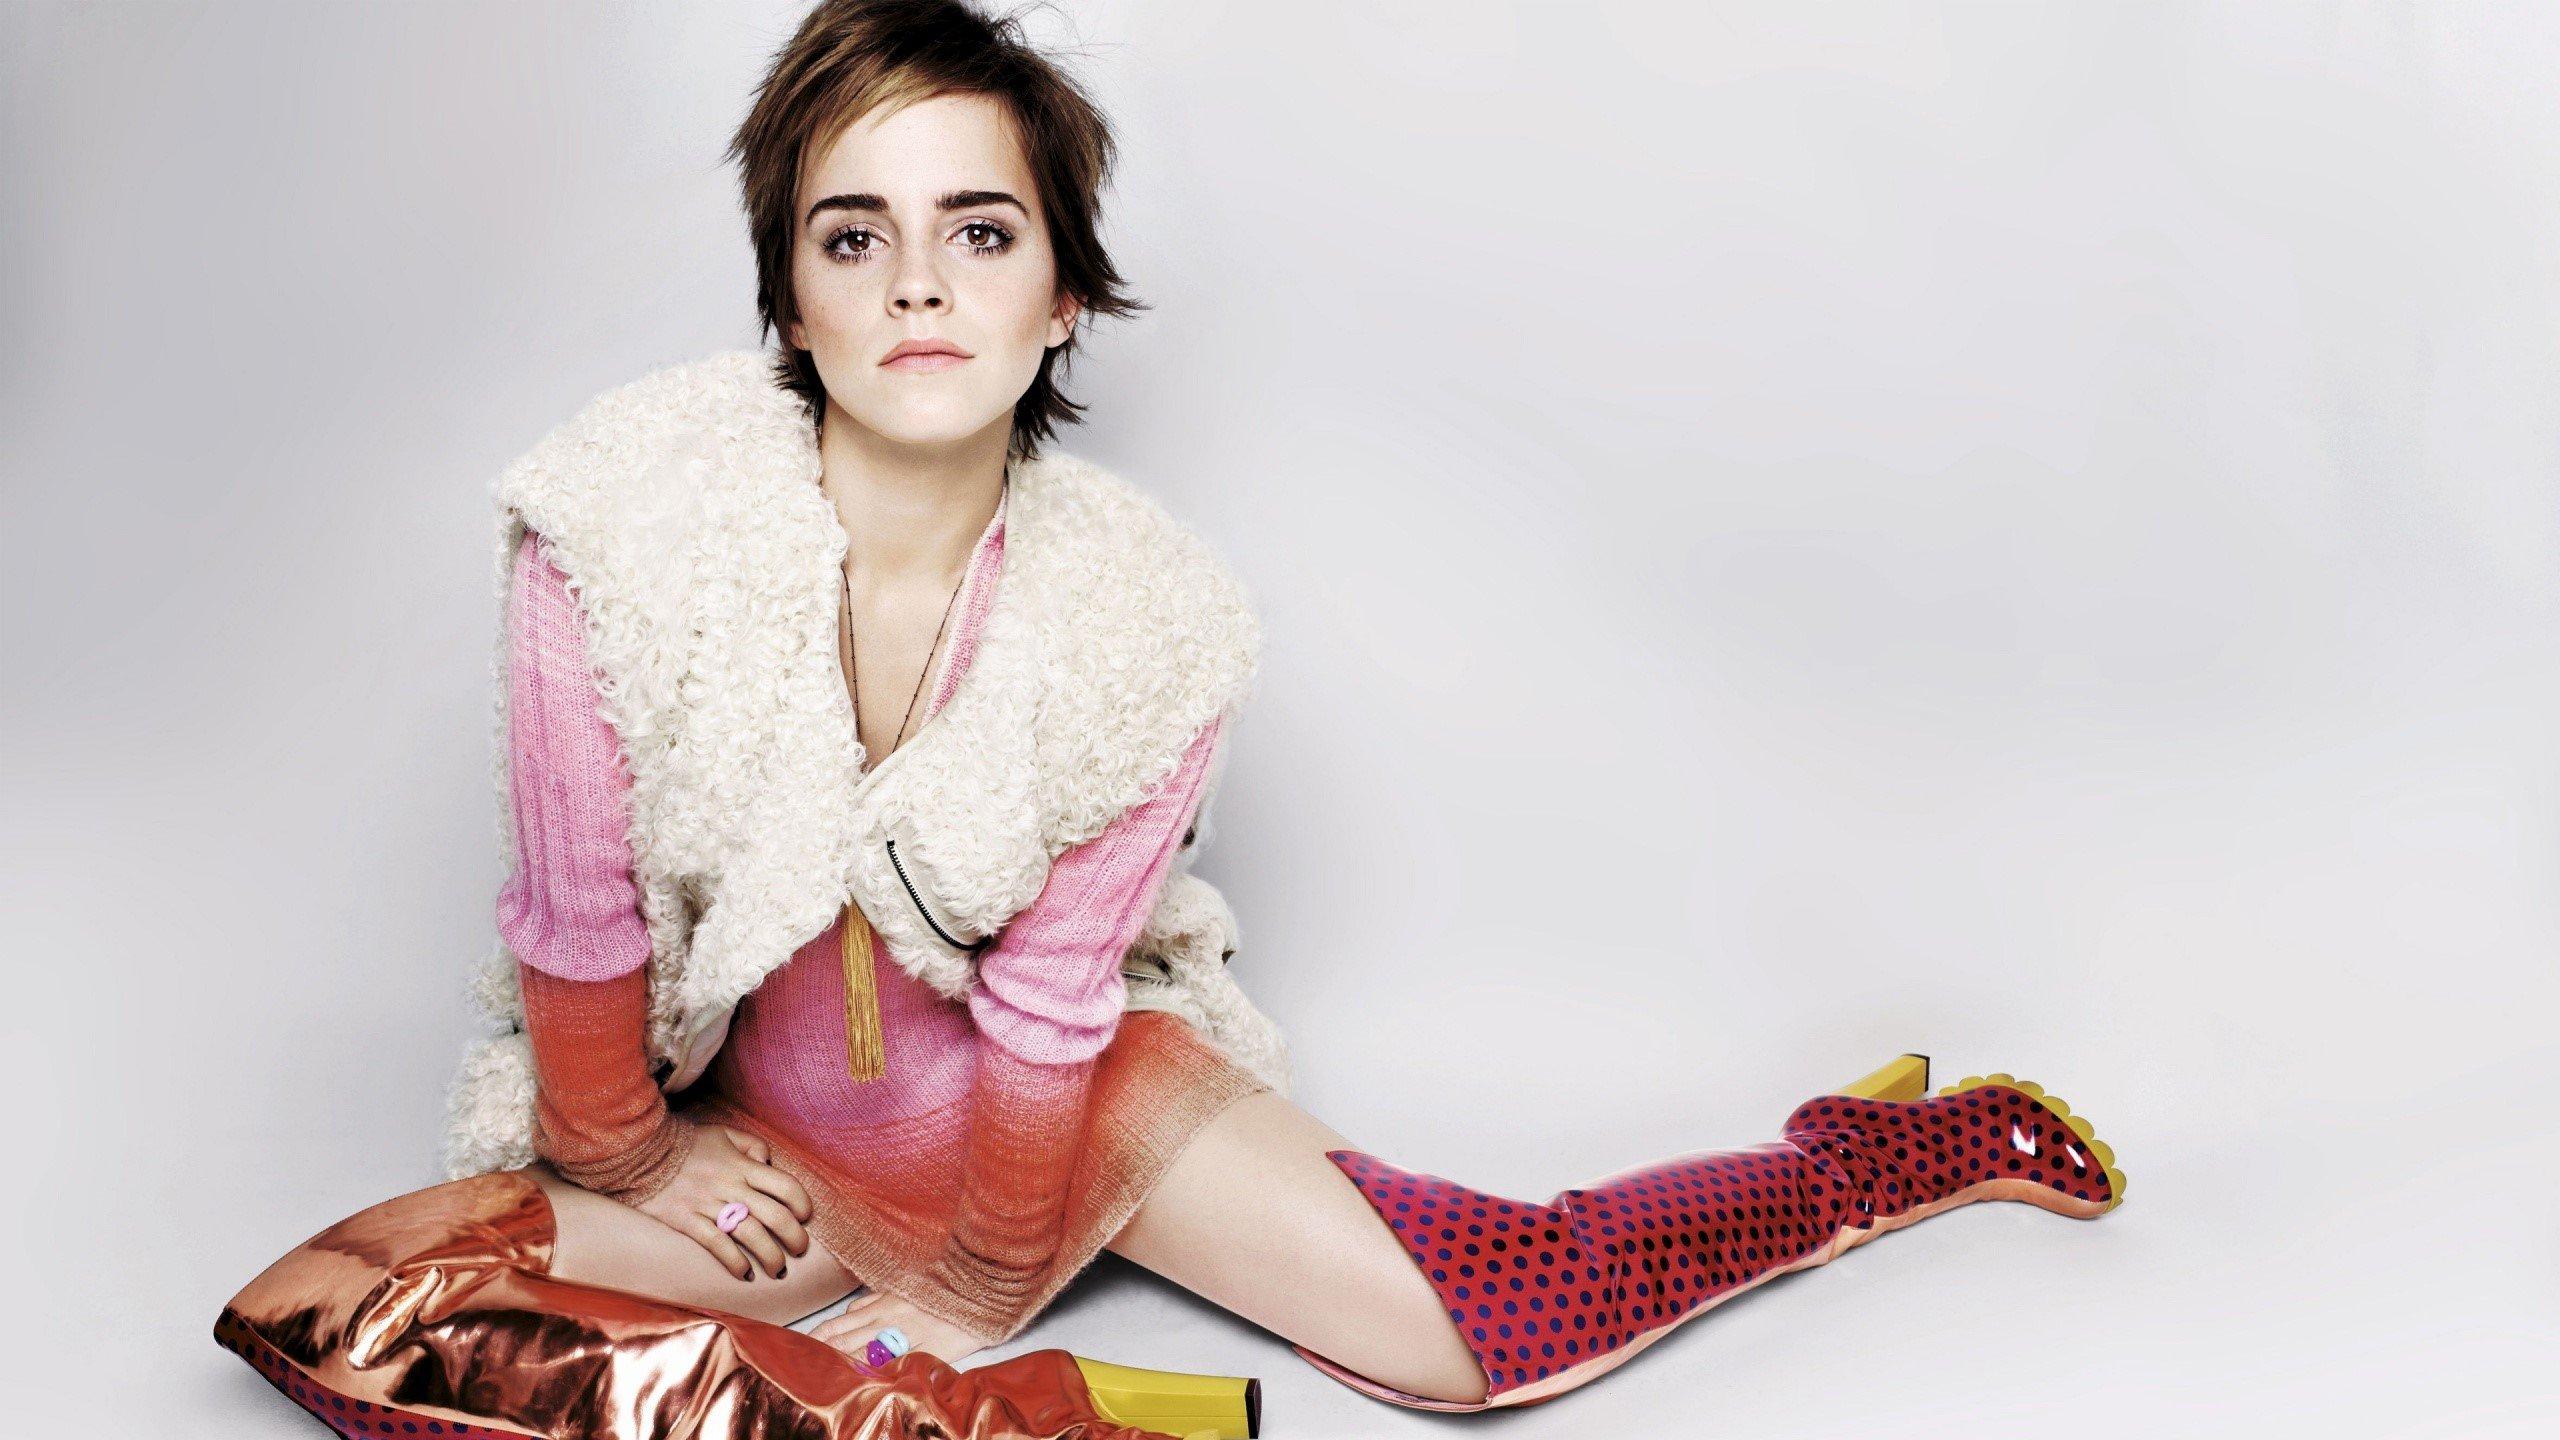 Fondo de pantalla de Emma Watson pixiecut Imágenes